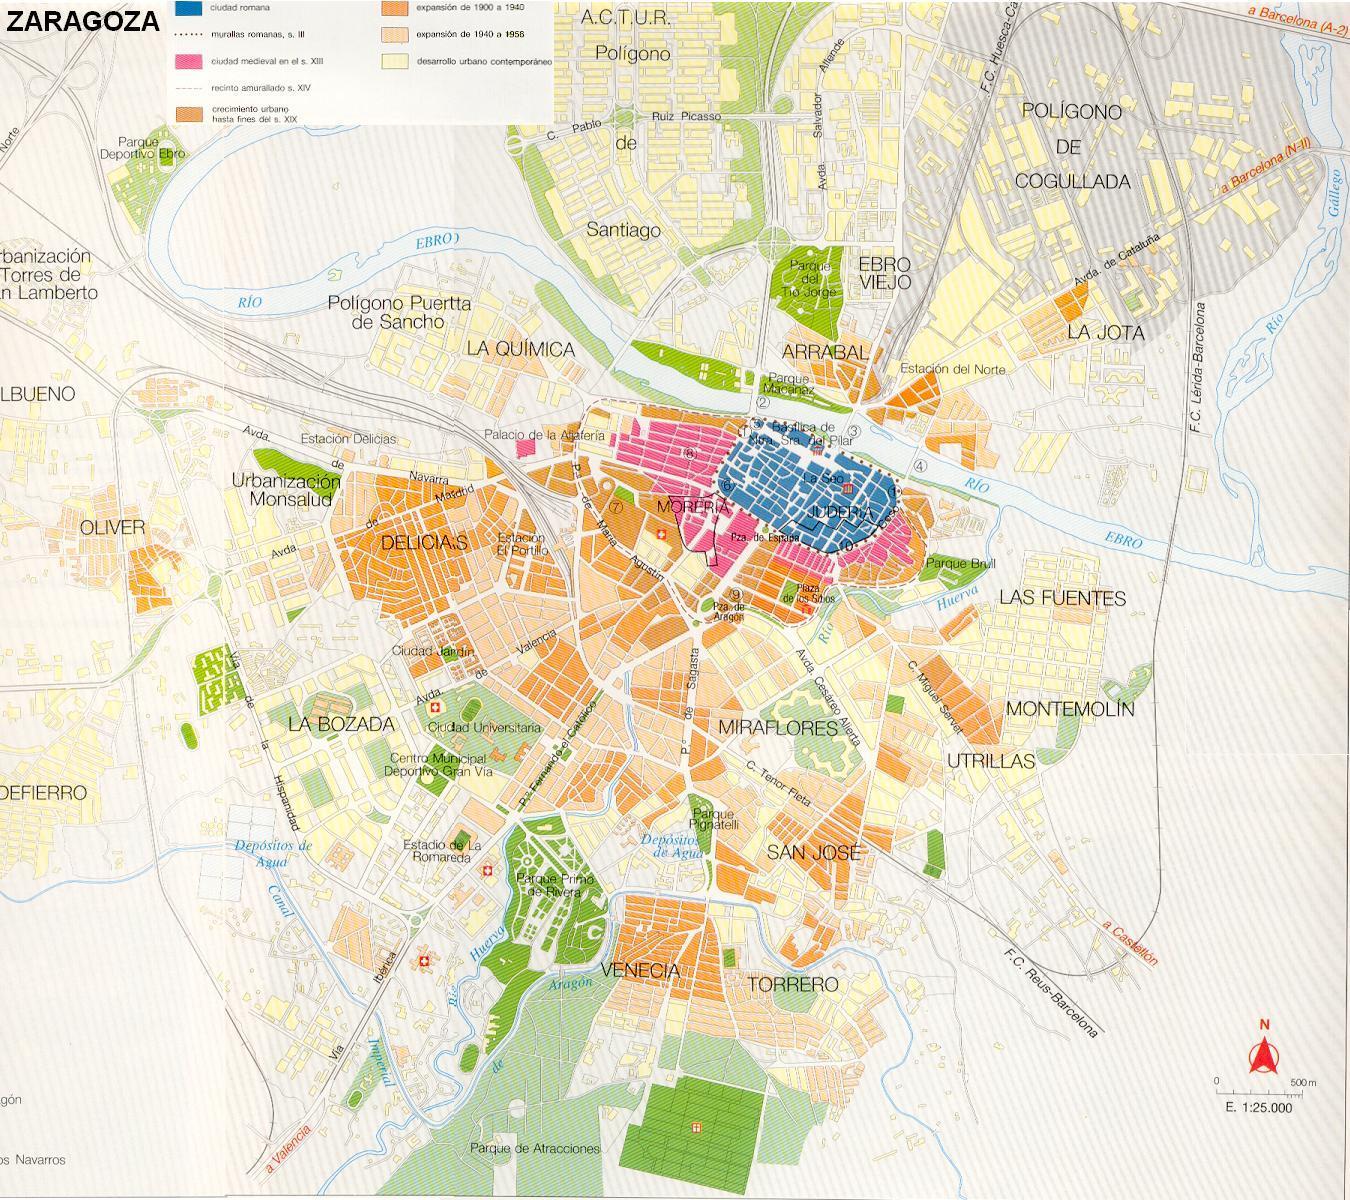 50313 código postal de Zaragoza